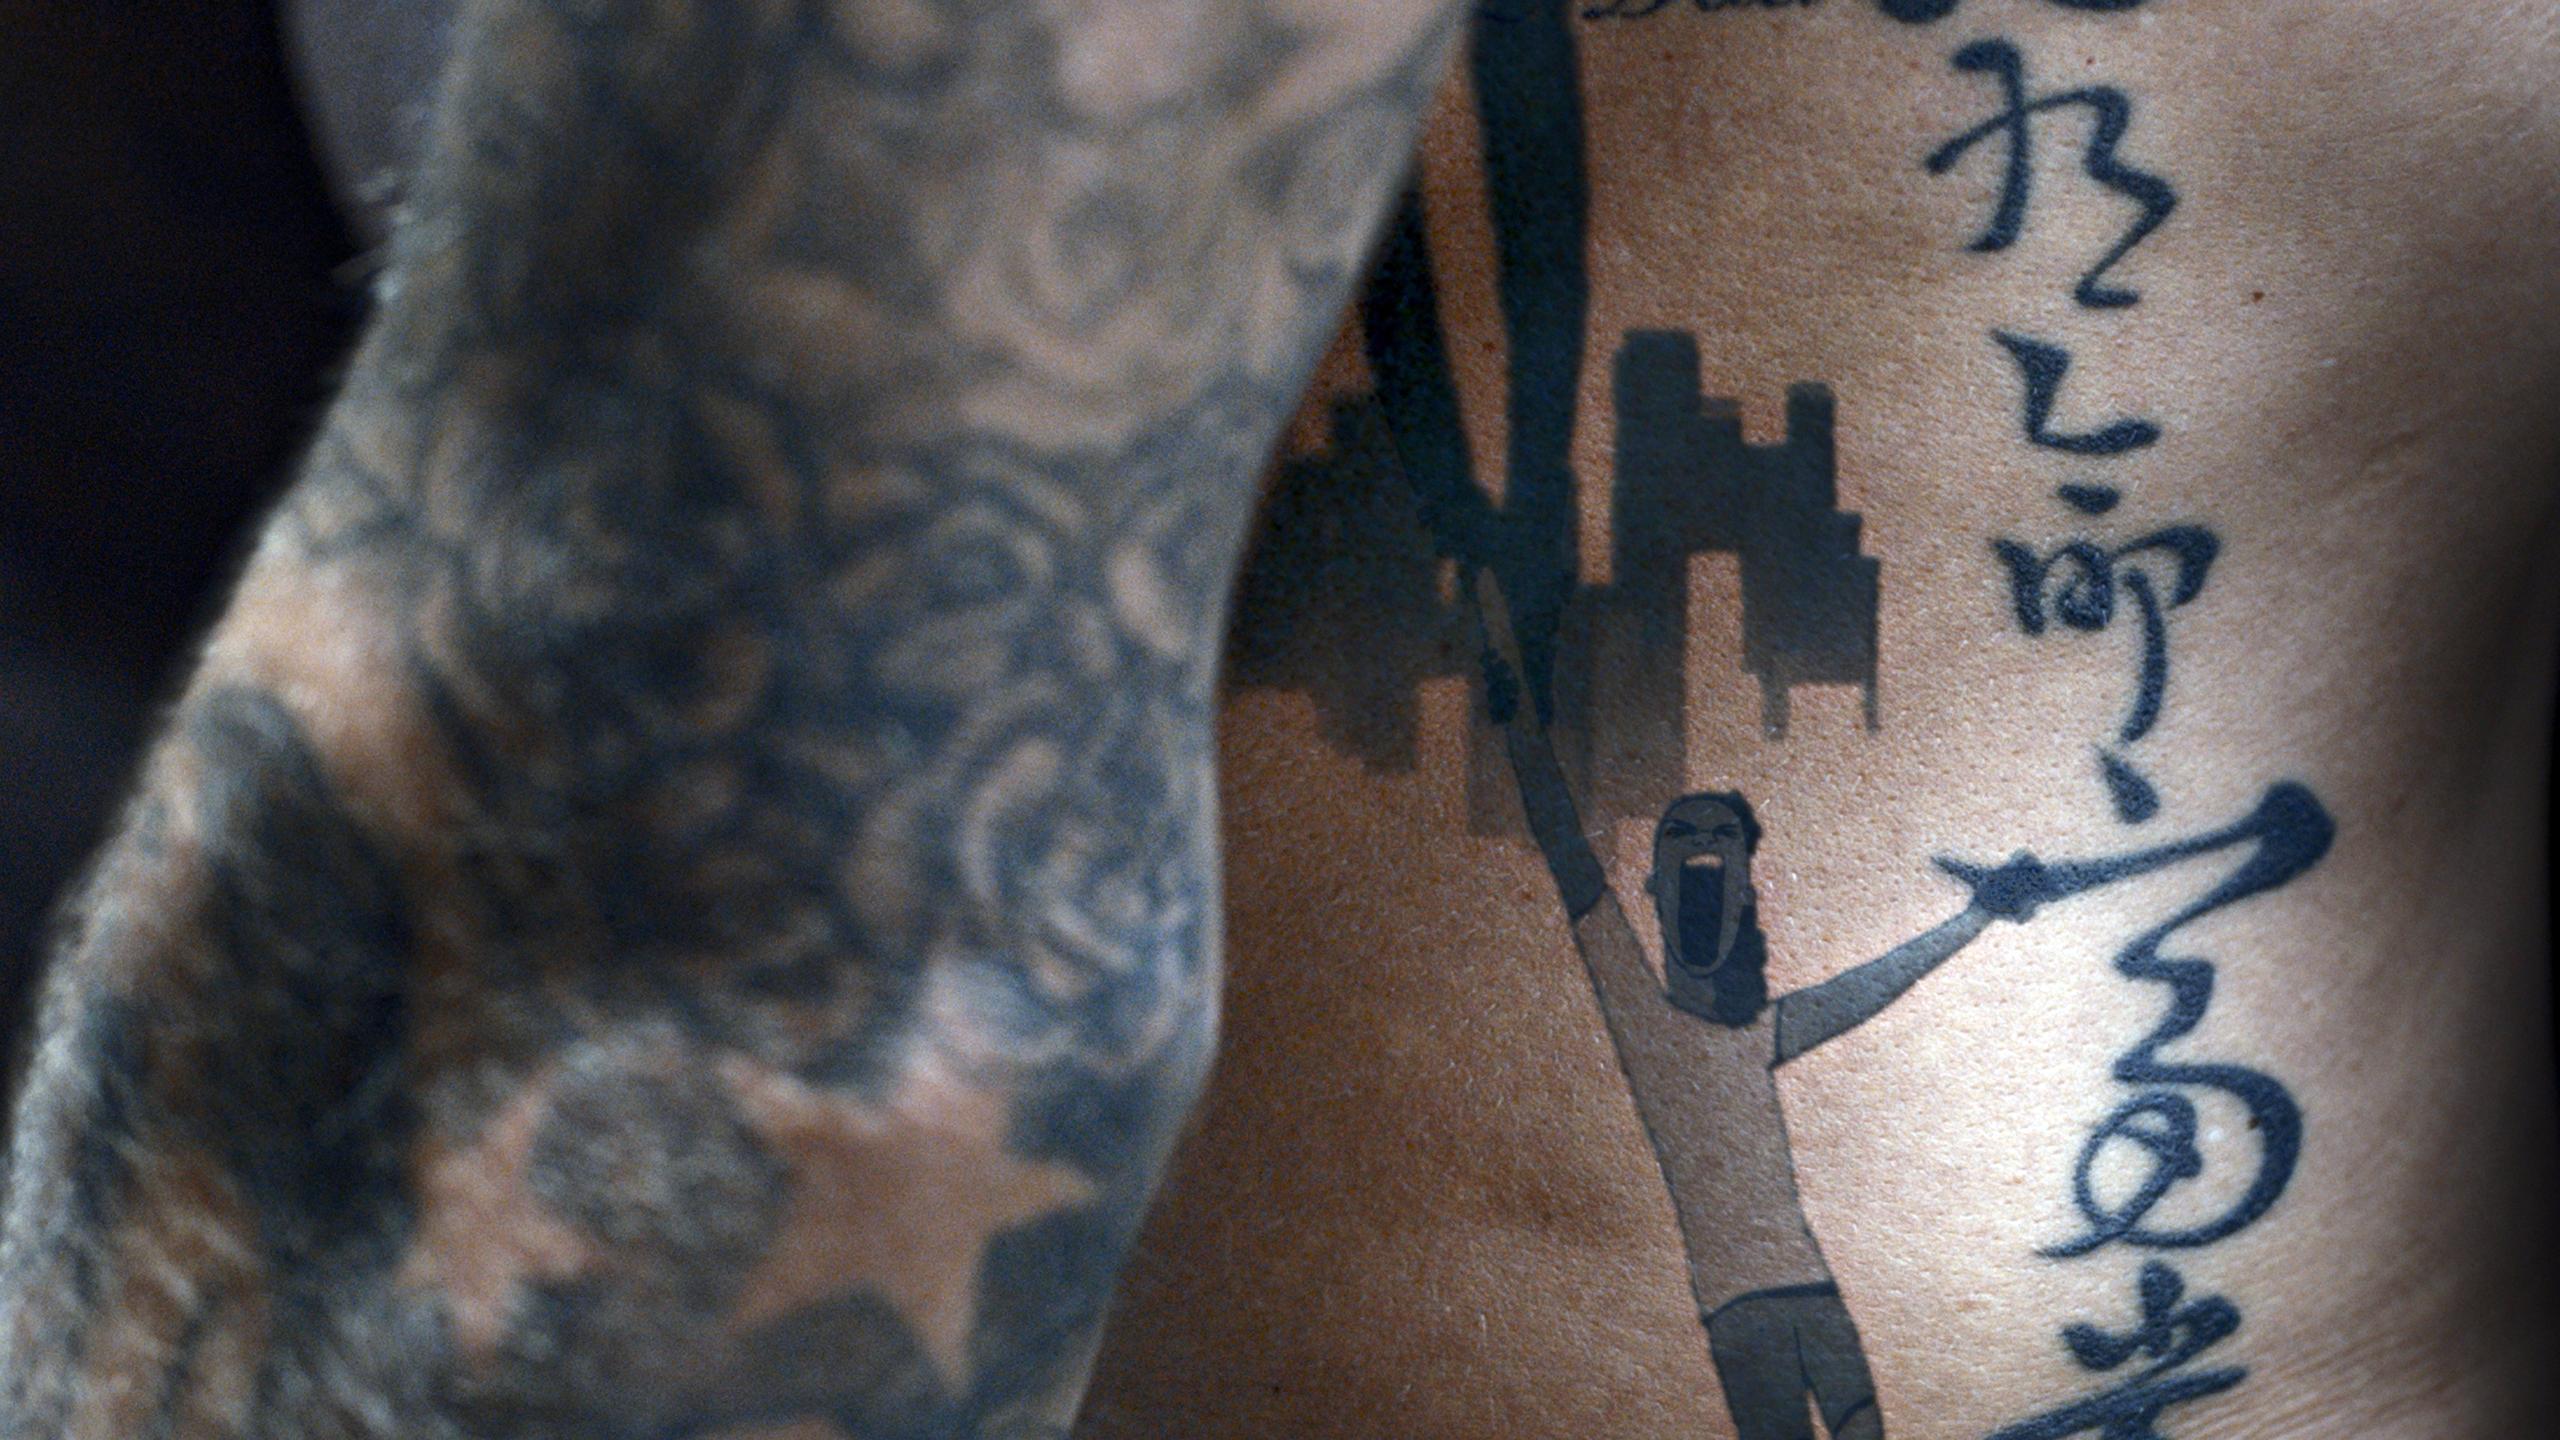 David Beckham Displays his Tattoos for Charity